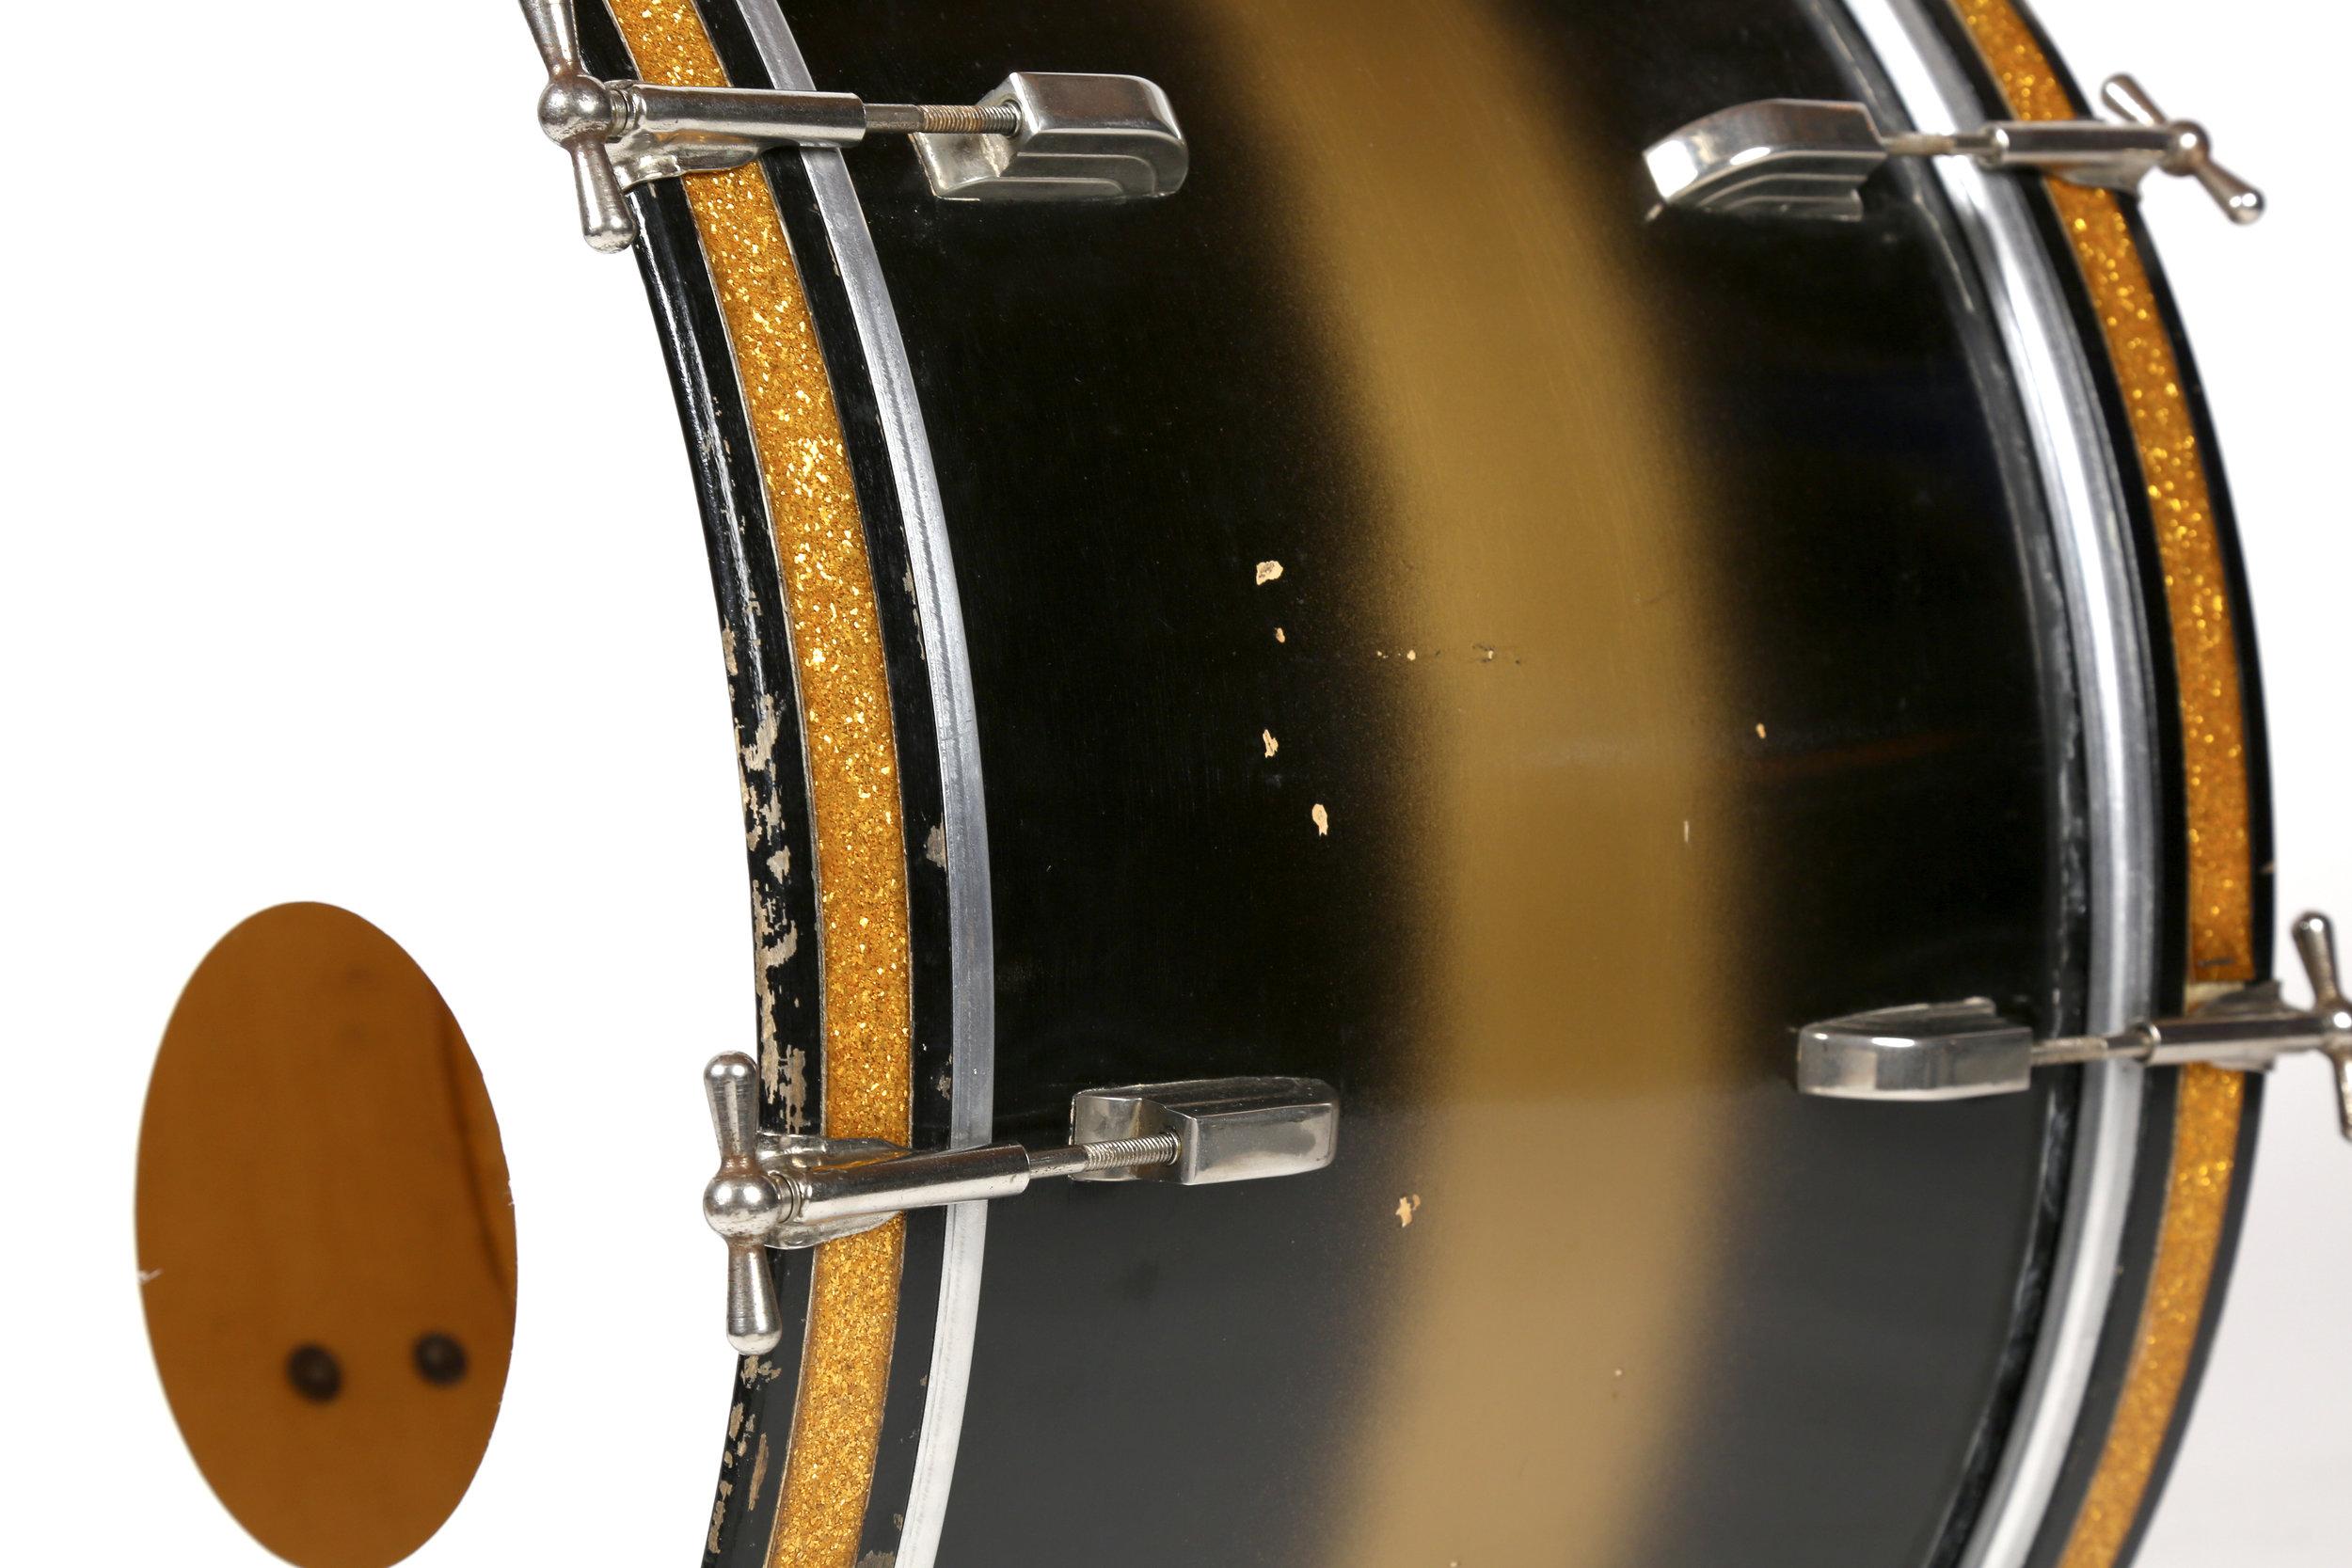 Dorio Vintage Drum_C&C Big Red_1961.jpg